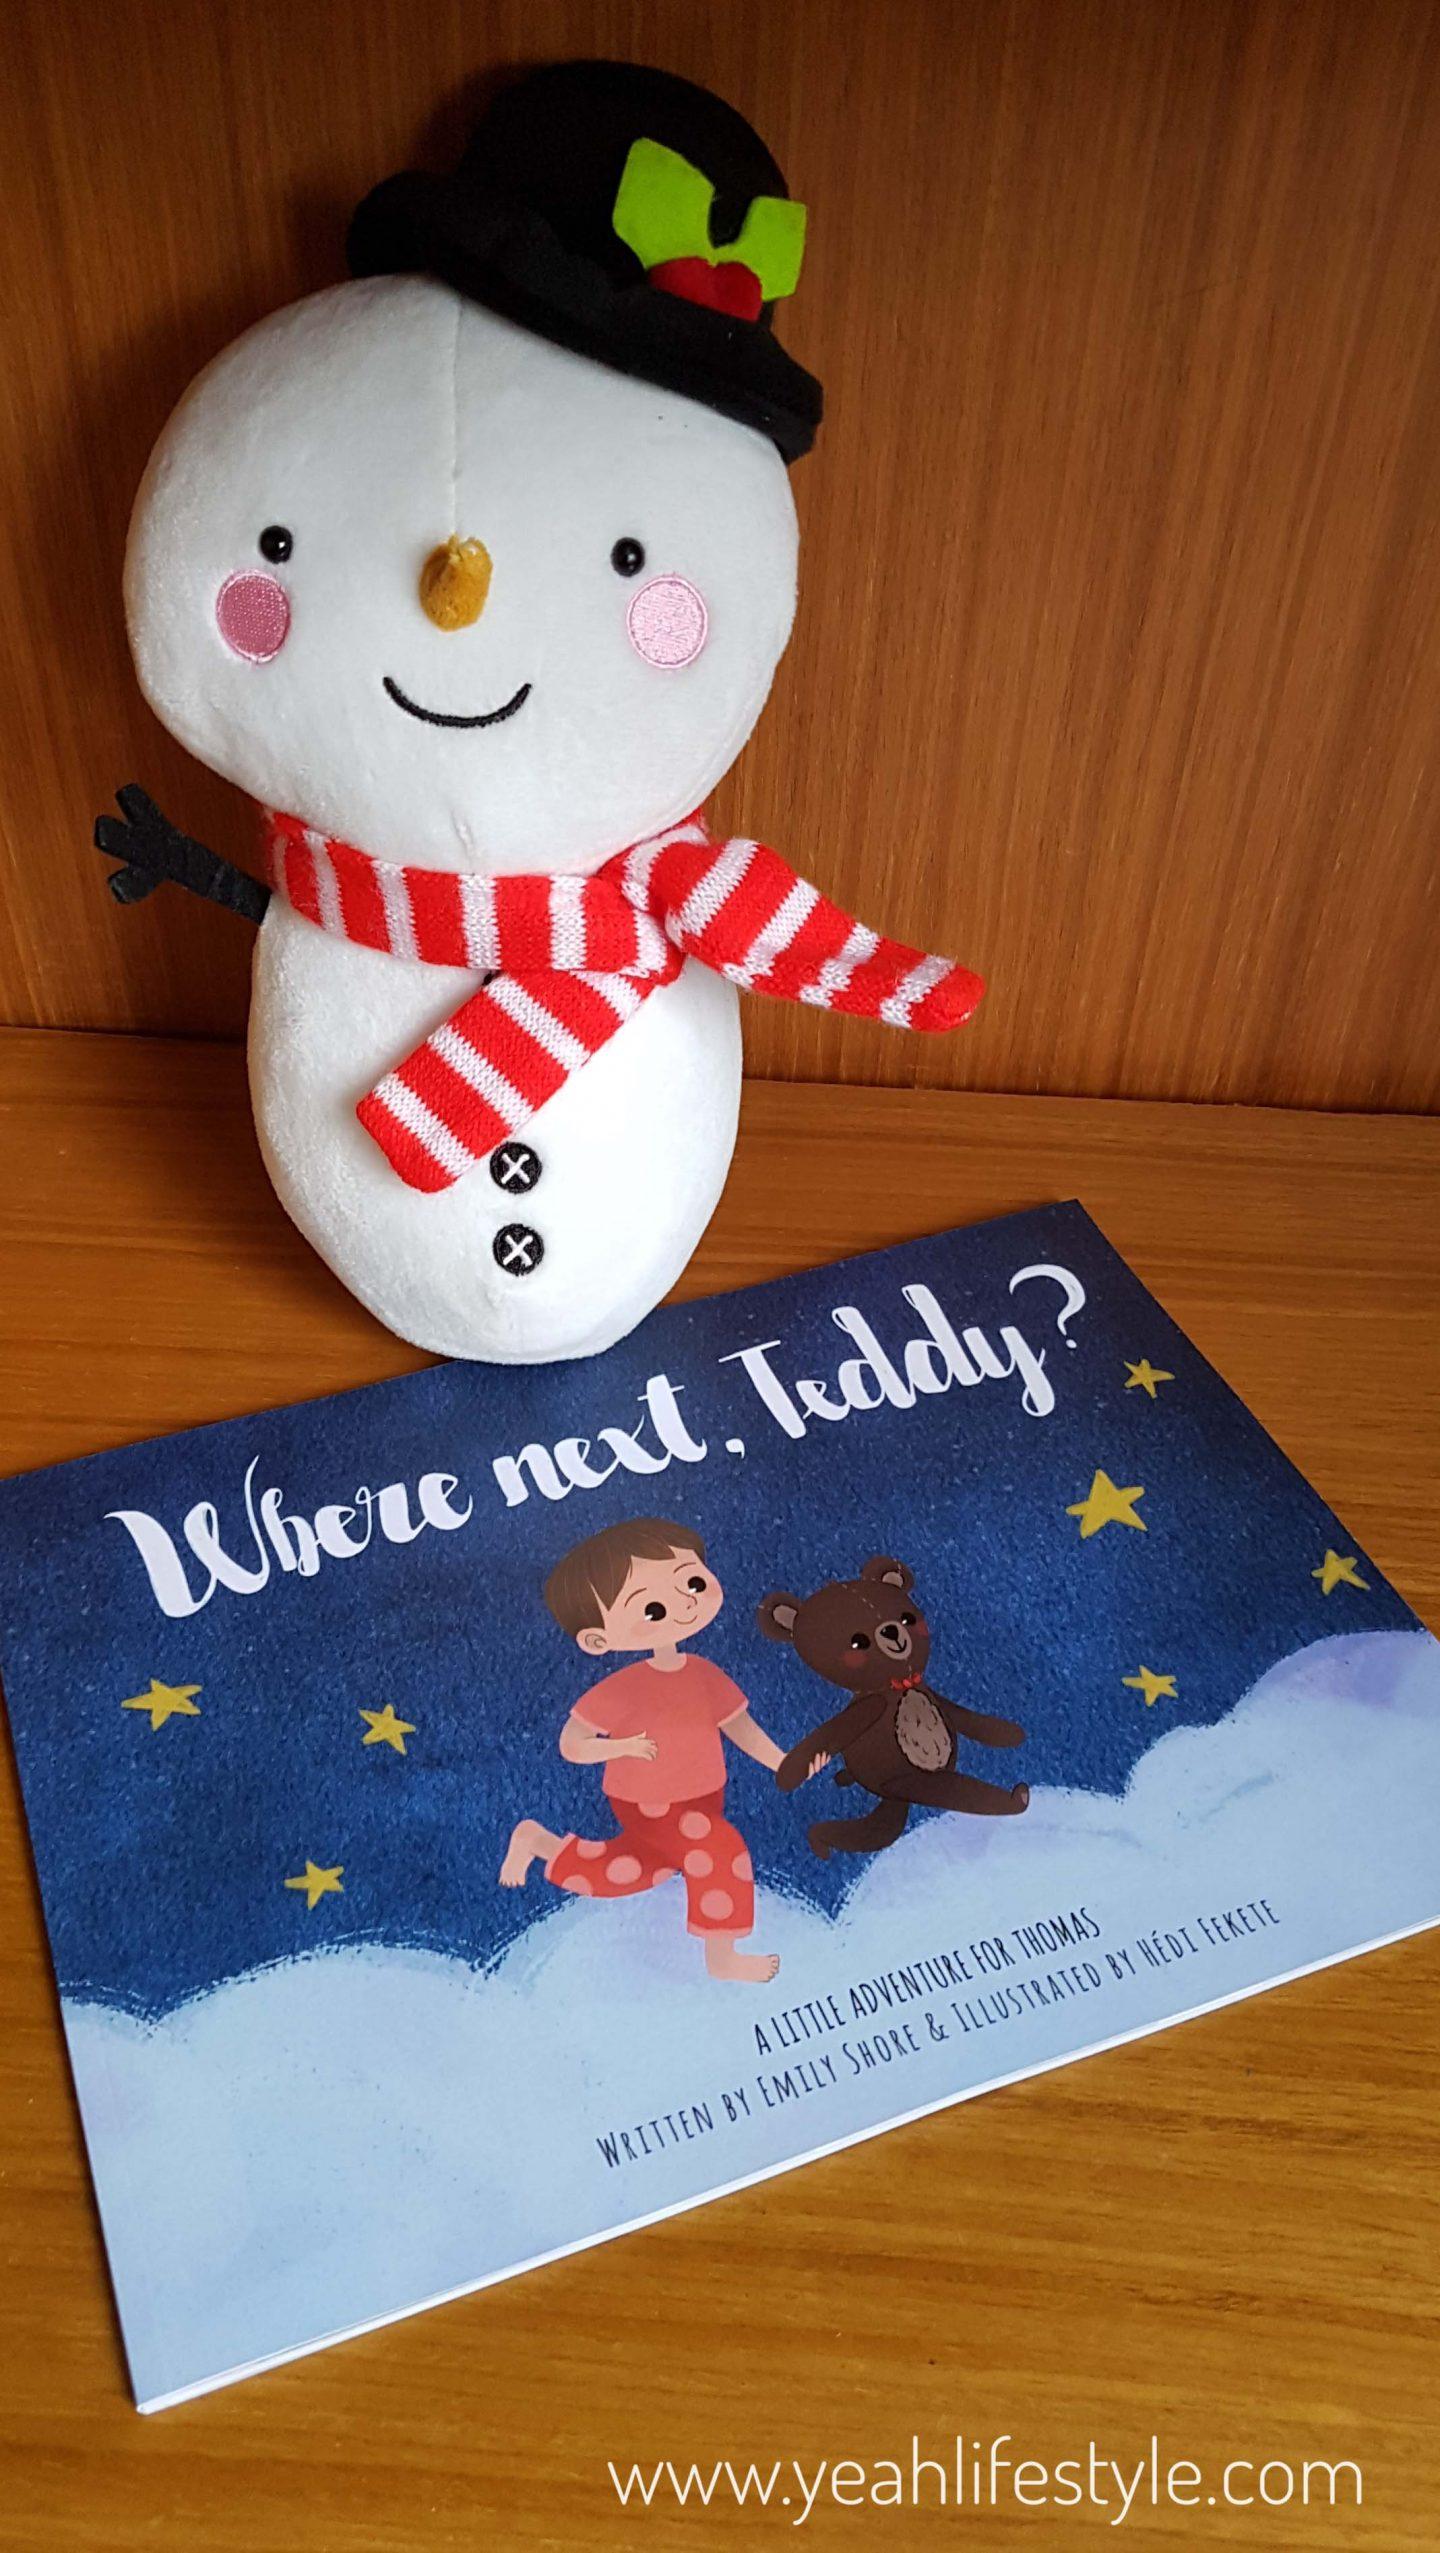 christmas-gift-guide-kids-book-blogger-gift-idea-where-next-teddy